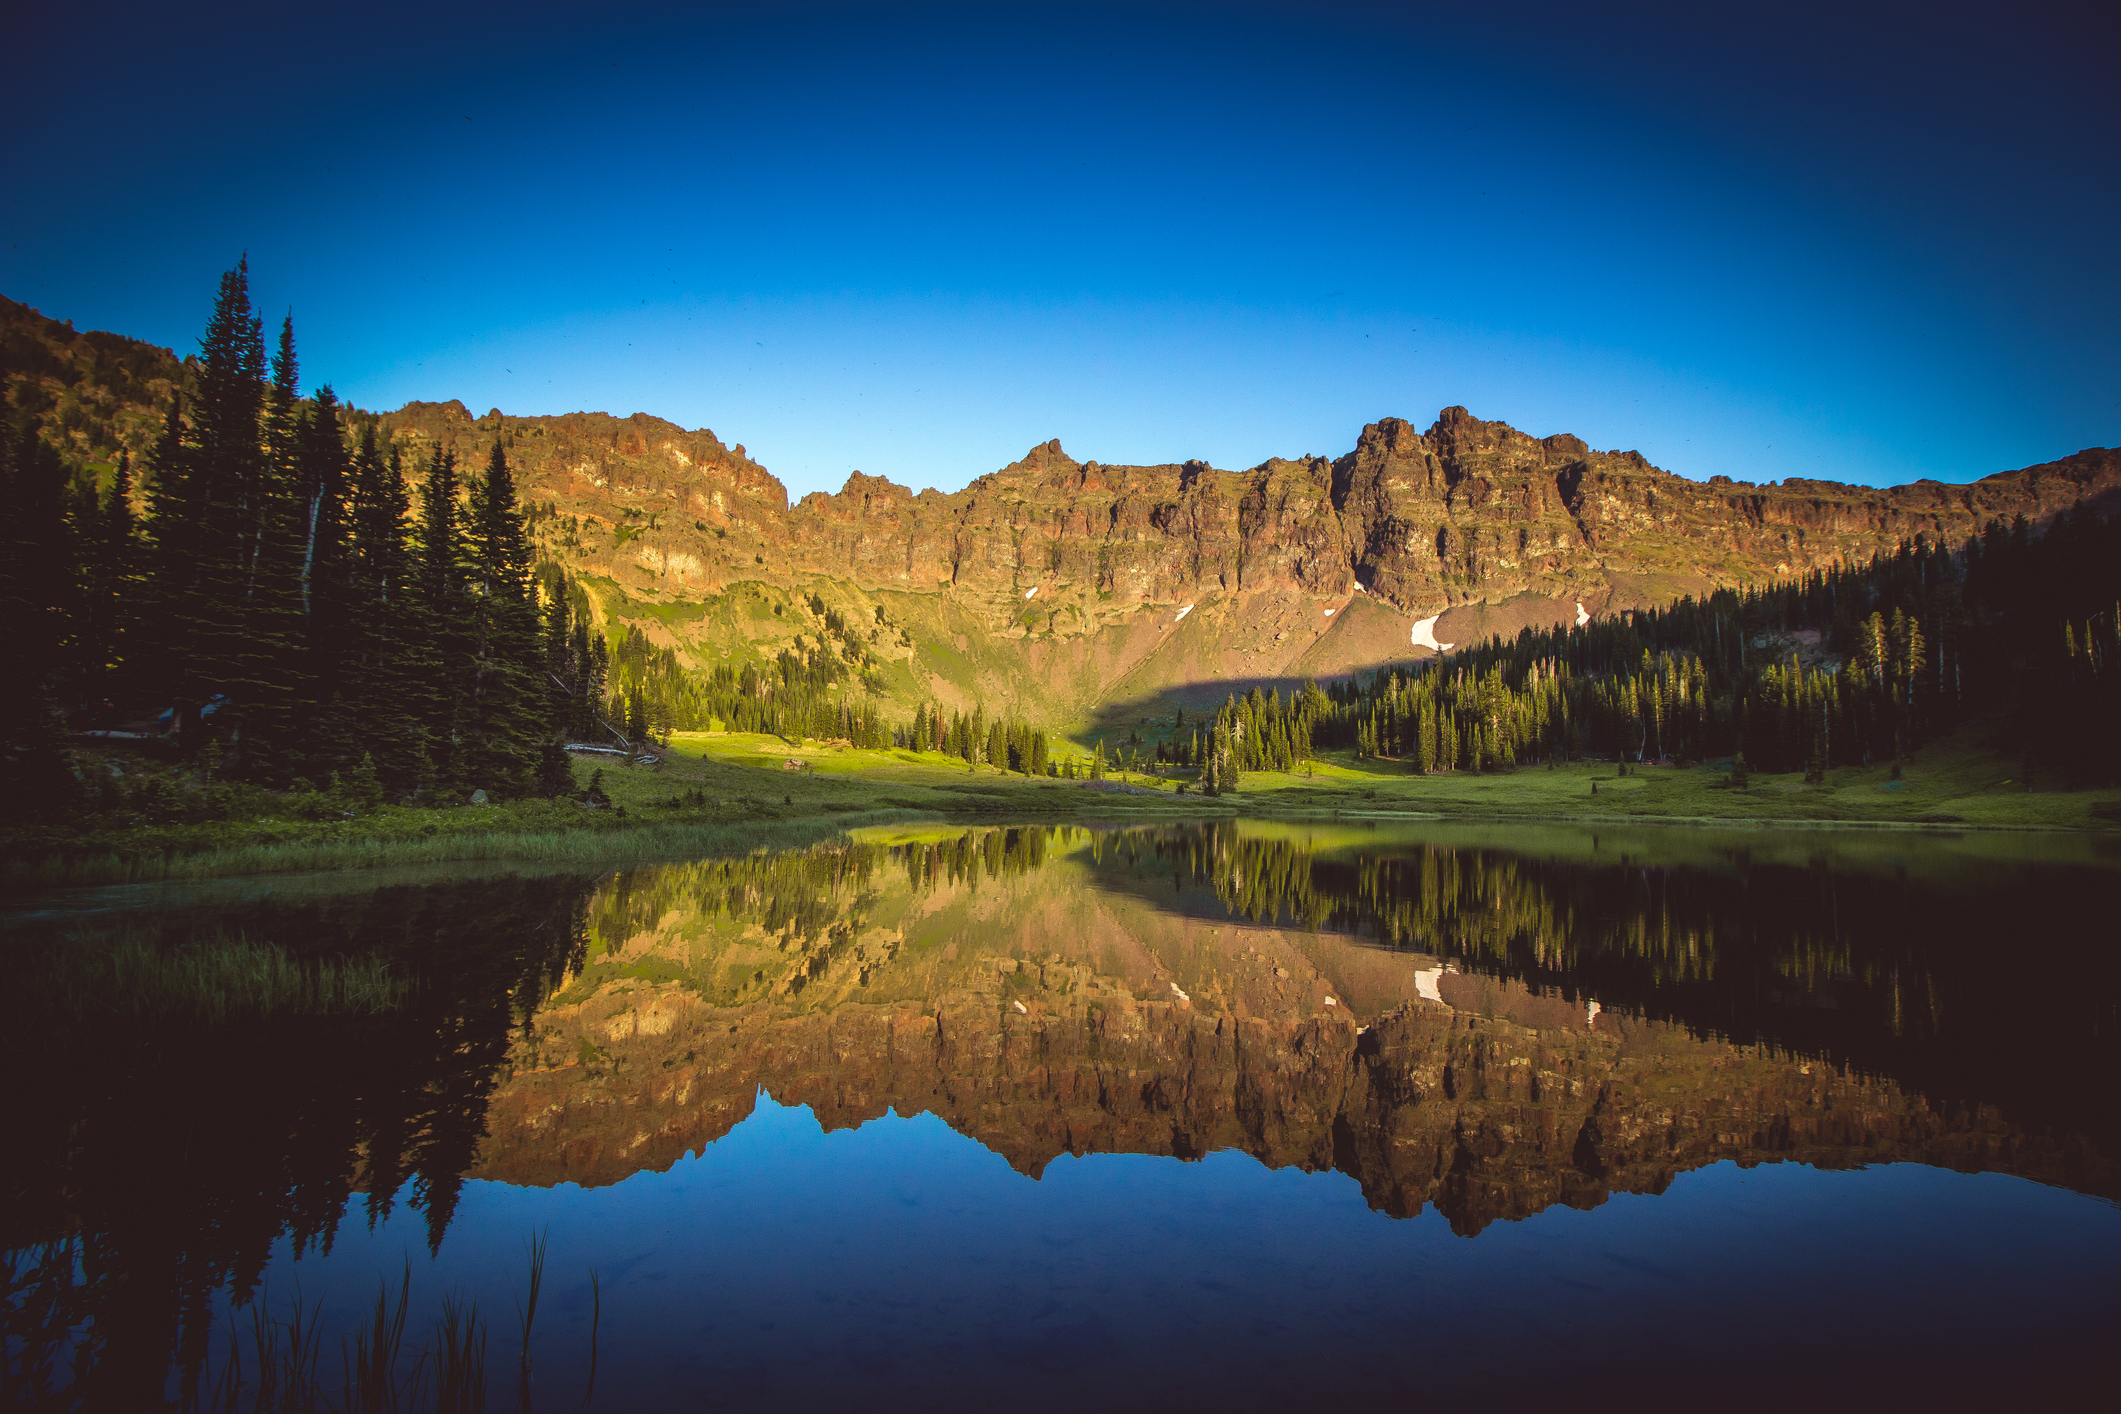 Lake reflecting rugged mountains.